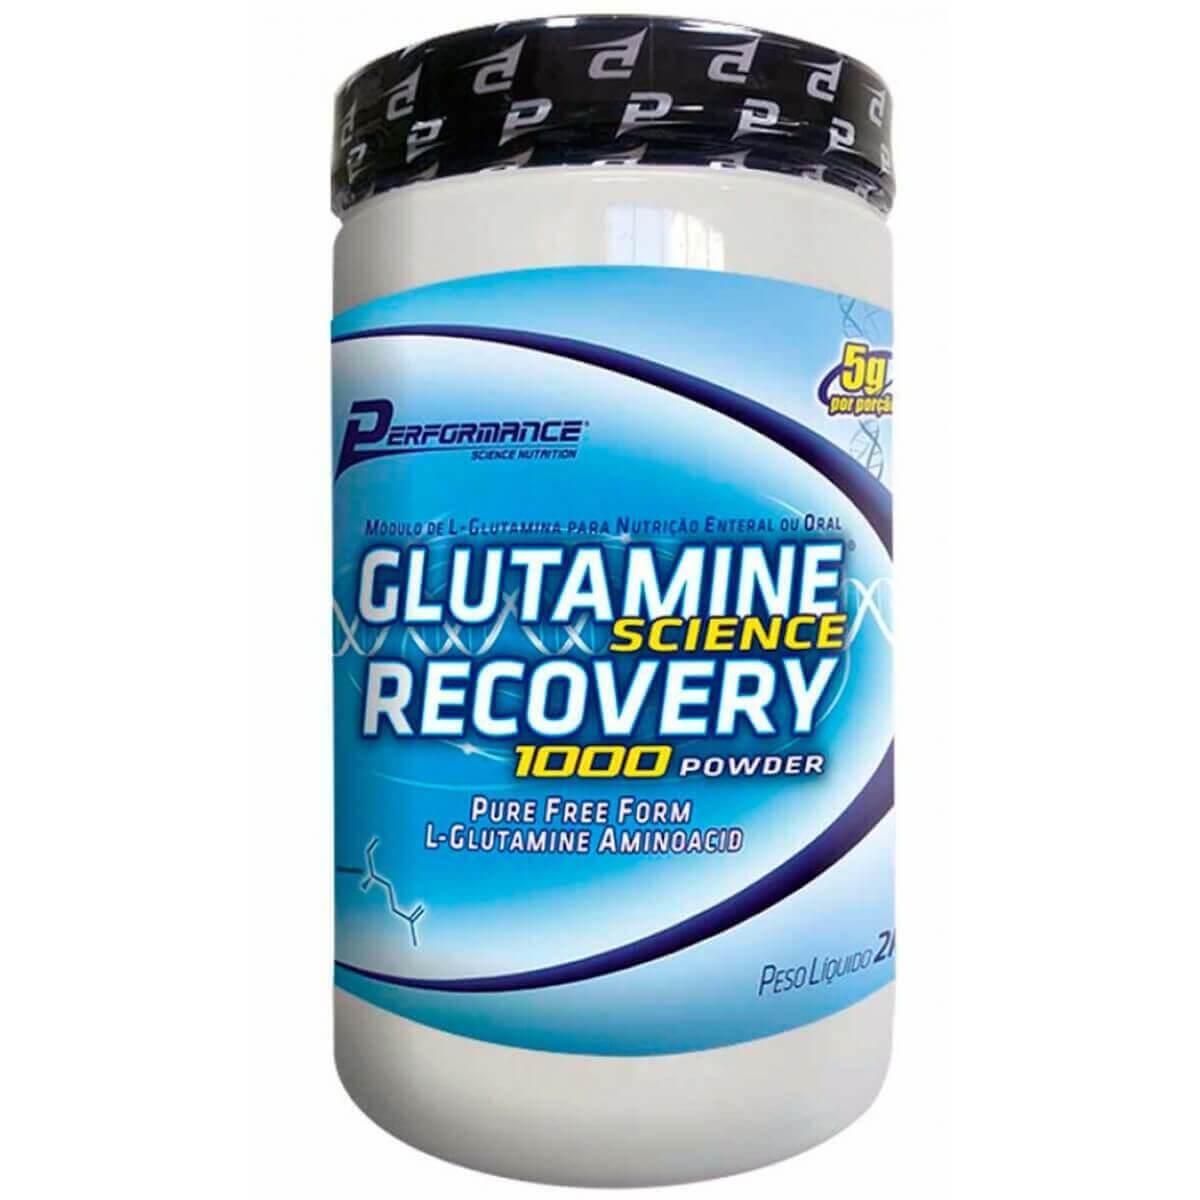 Glutamine Science Recovery 1000 Powder Performance Nutrition - 2kg